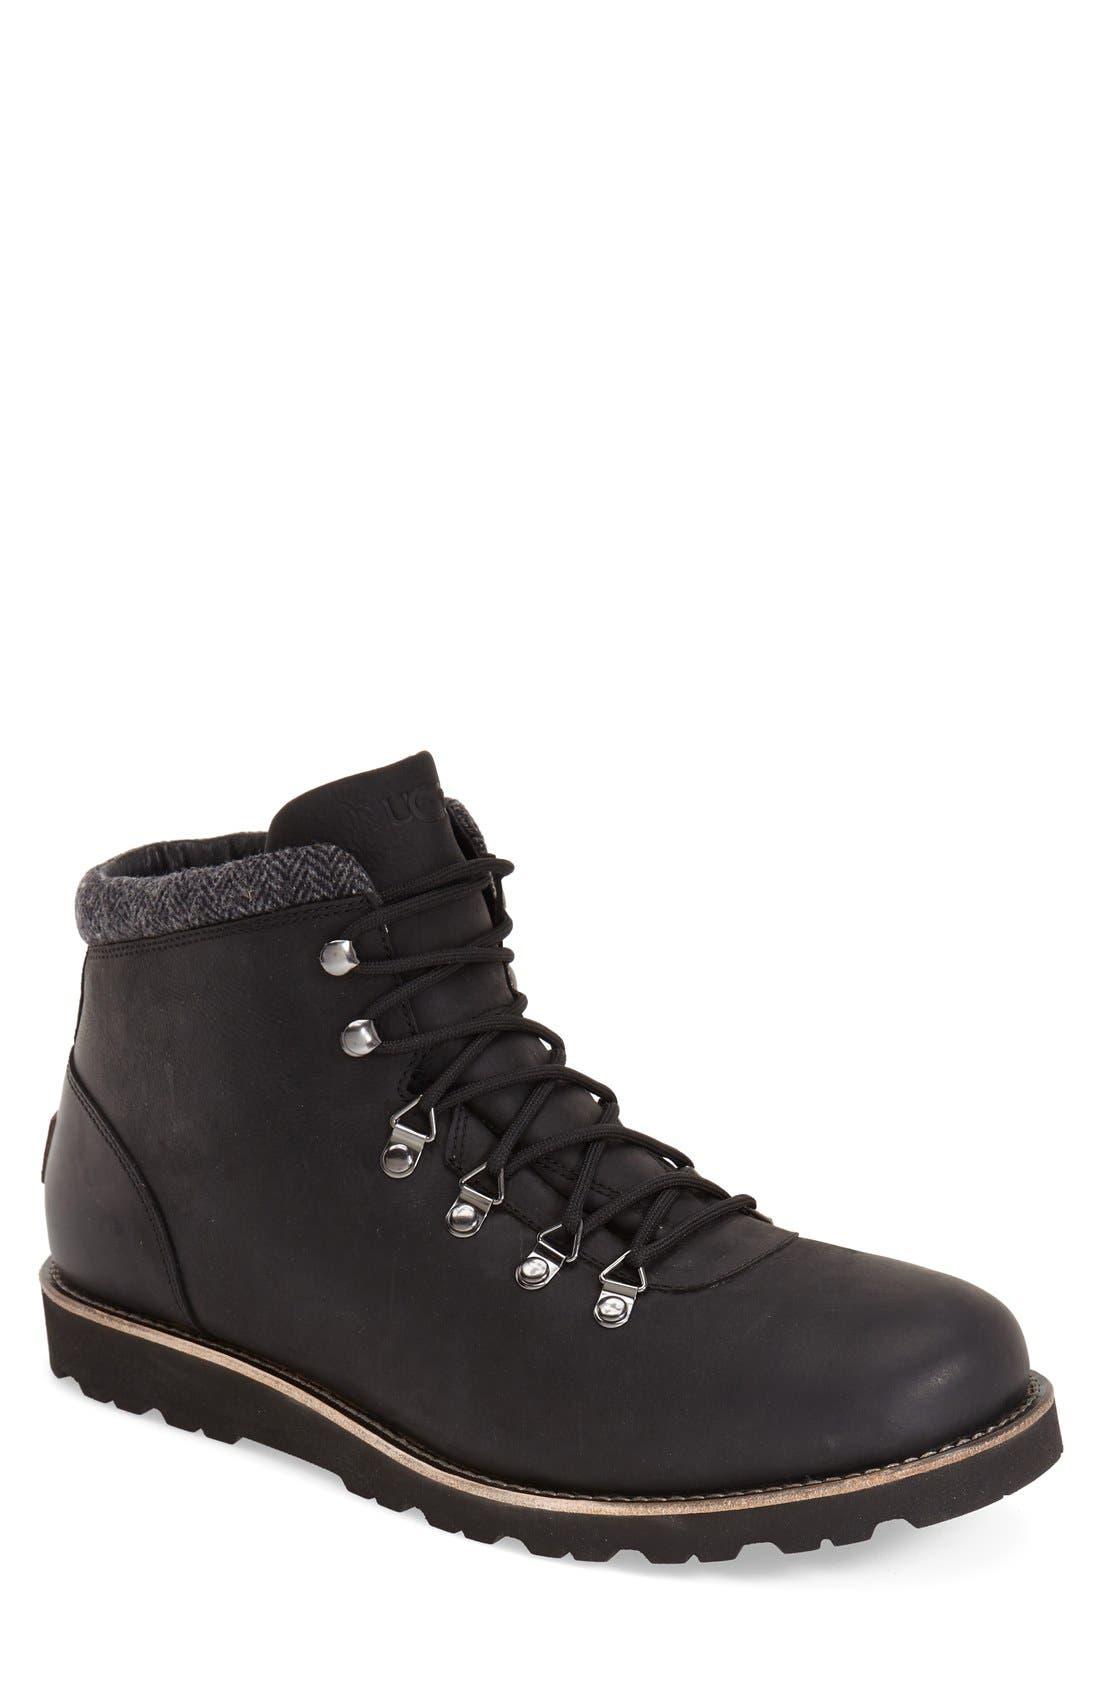 Boysen Waterproof Boot, Main, color, 001